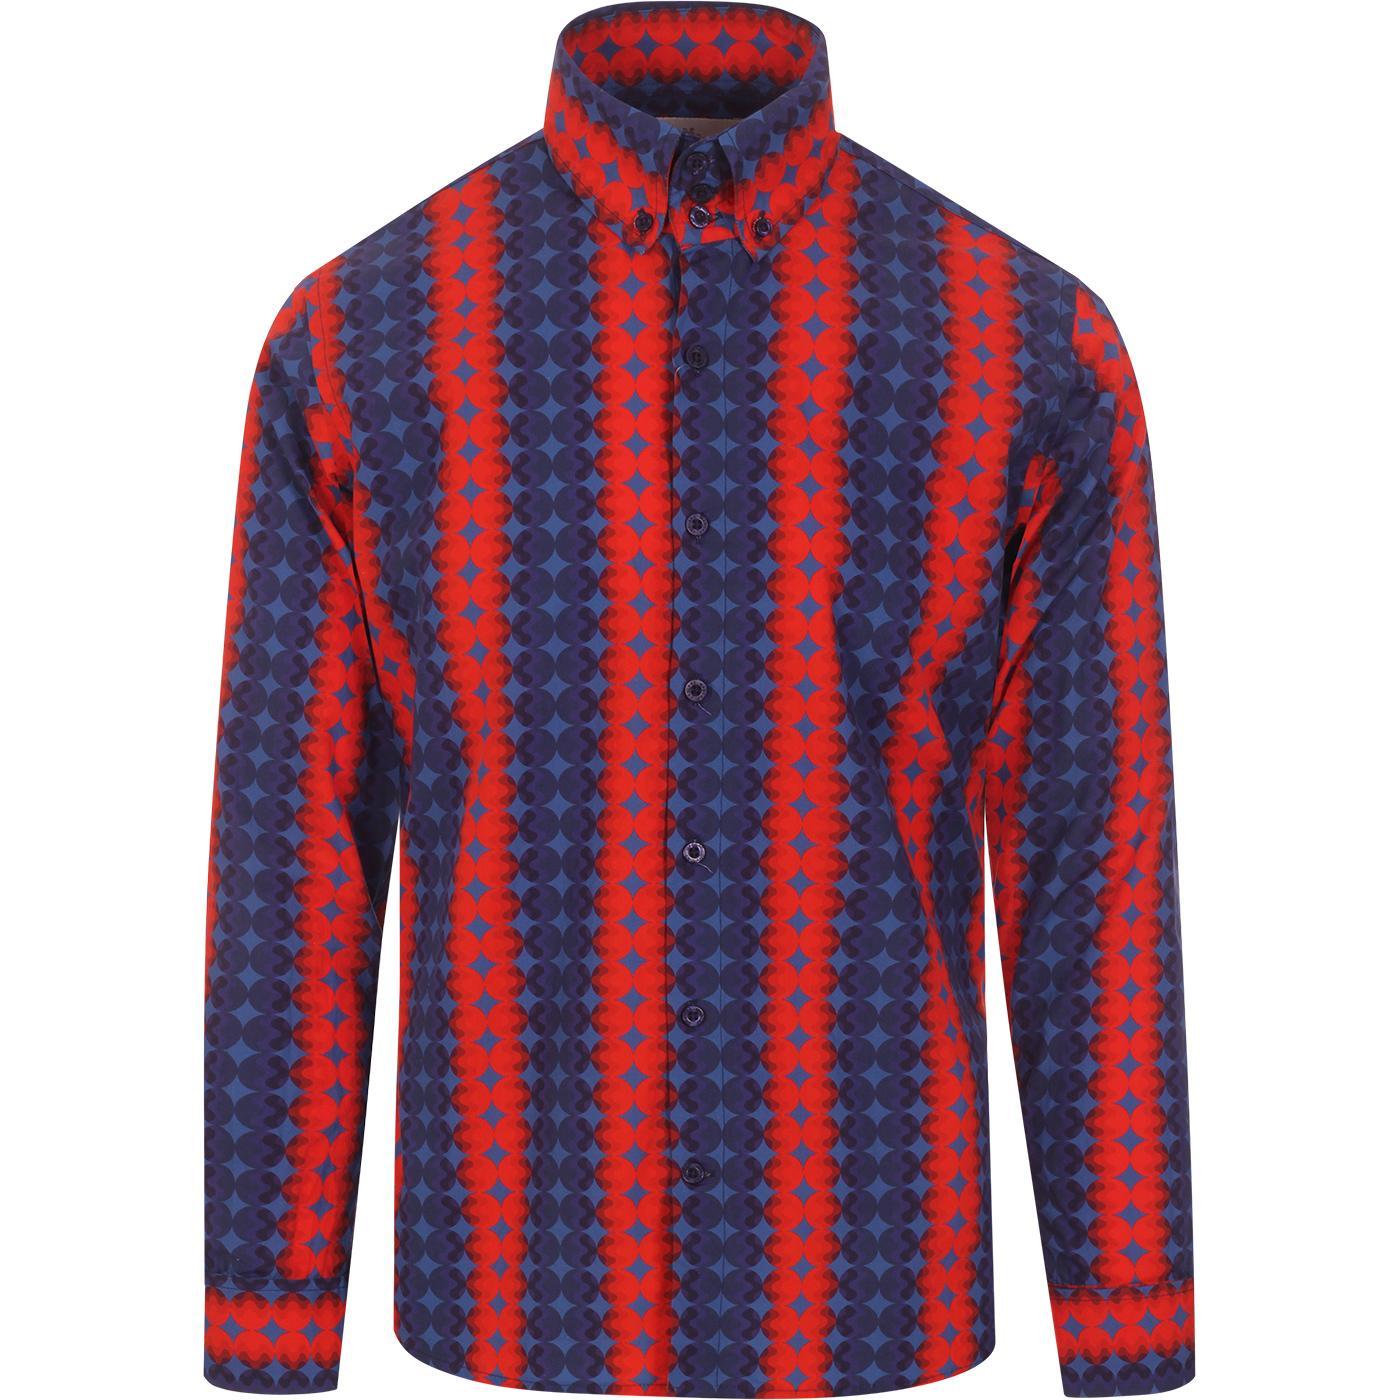 madcap england mens high collar bold dots pattern long sleeve shirt blue red